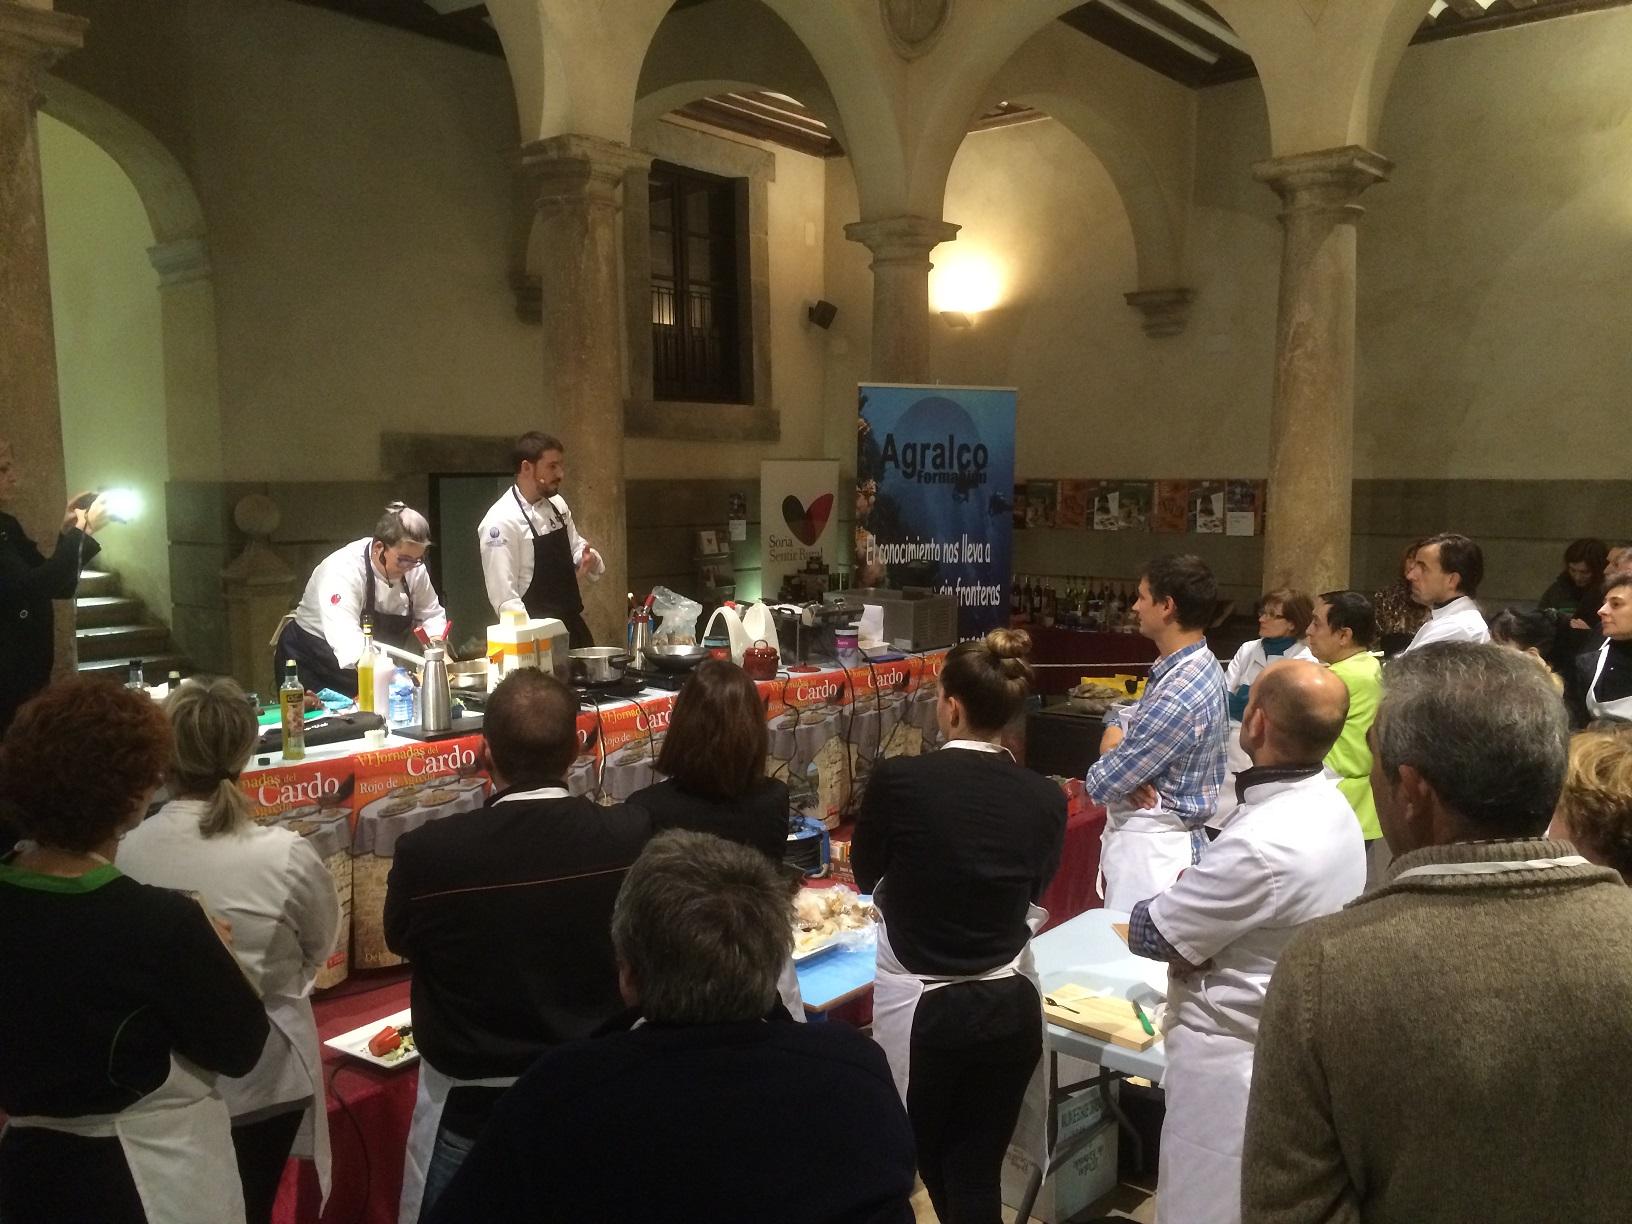 Javier Estevez cocina Agralco Formacion